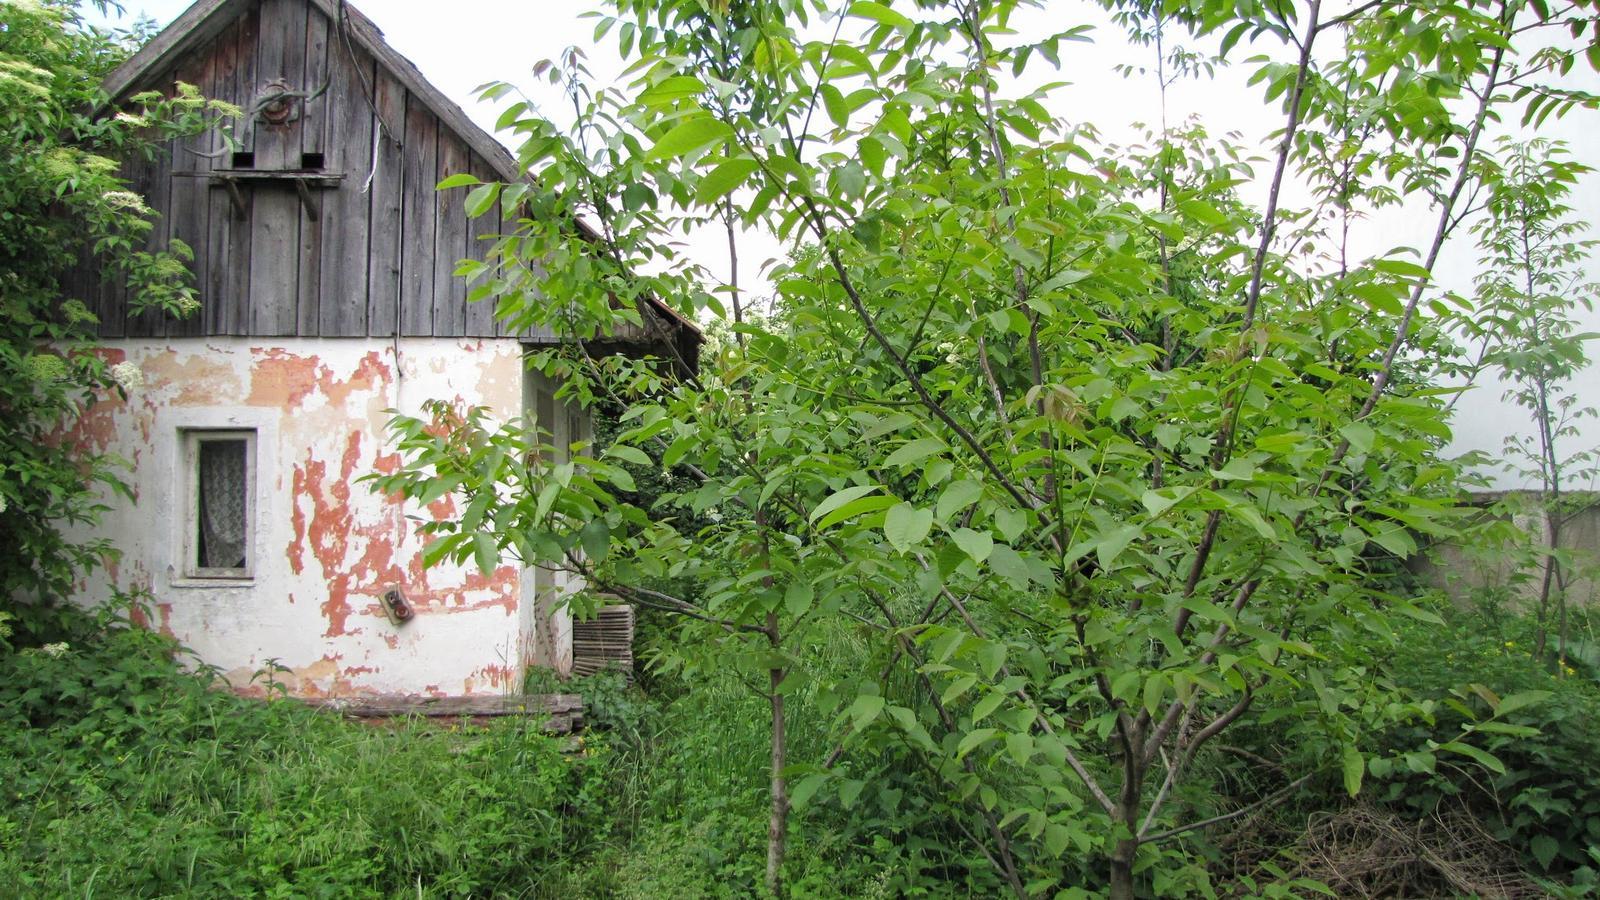 Rekonštrukcia starého domčeka - Letná kuchynka .V budúcnosti asi garáž.